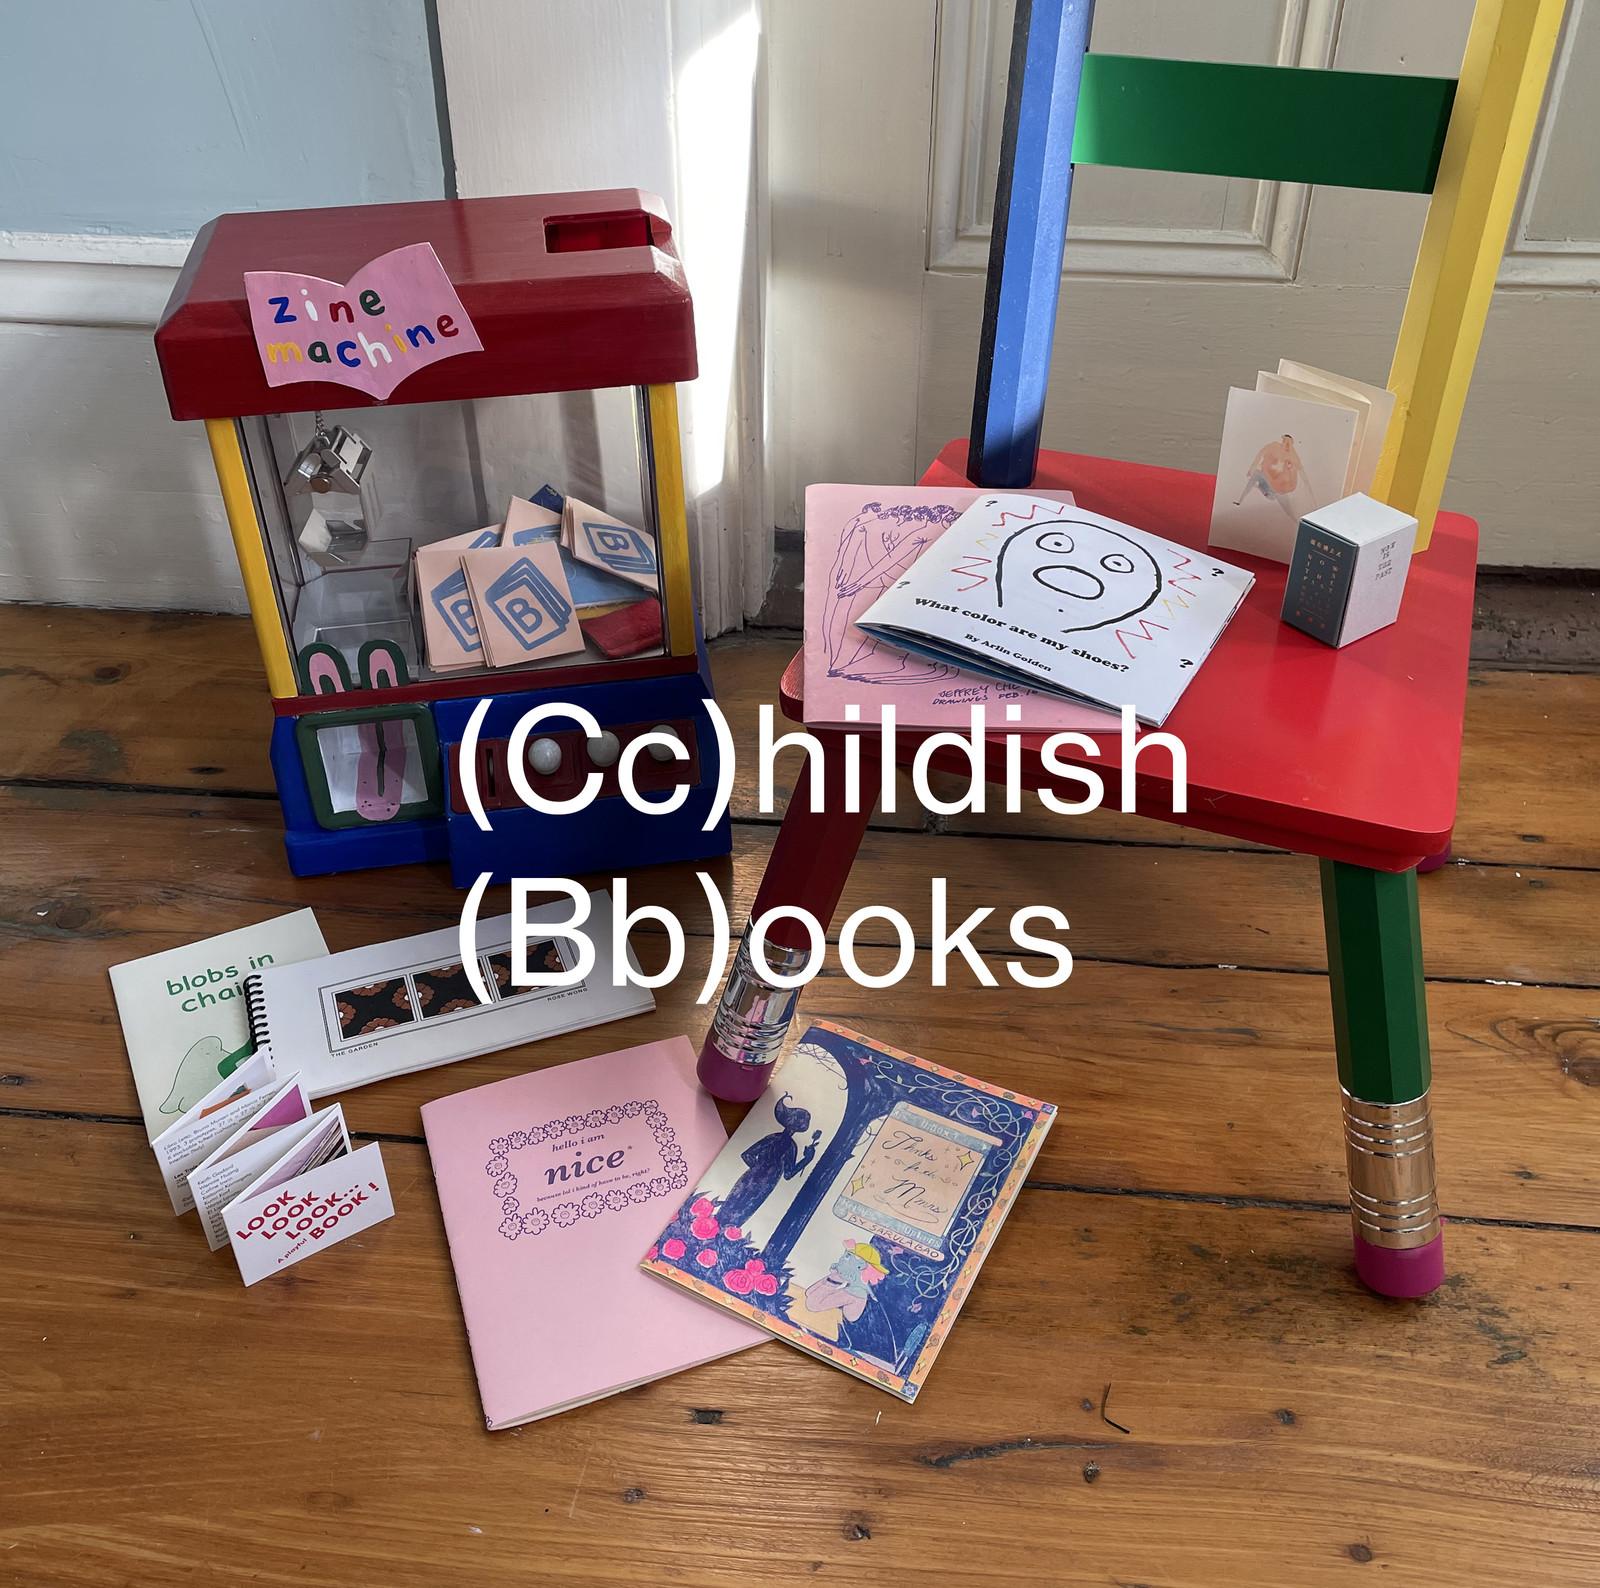 Childish Books